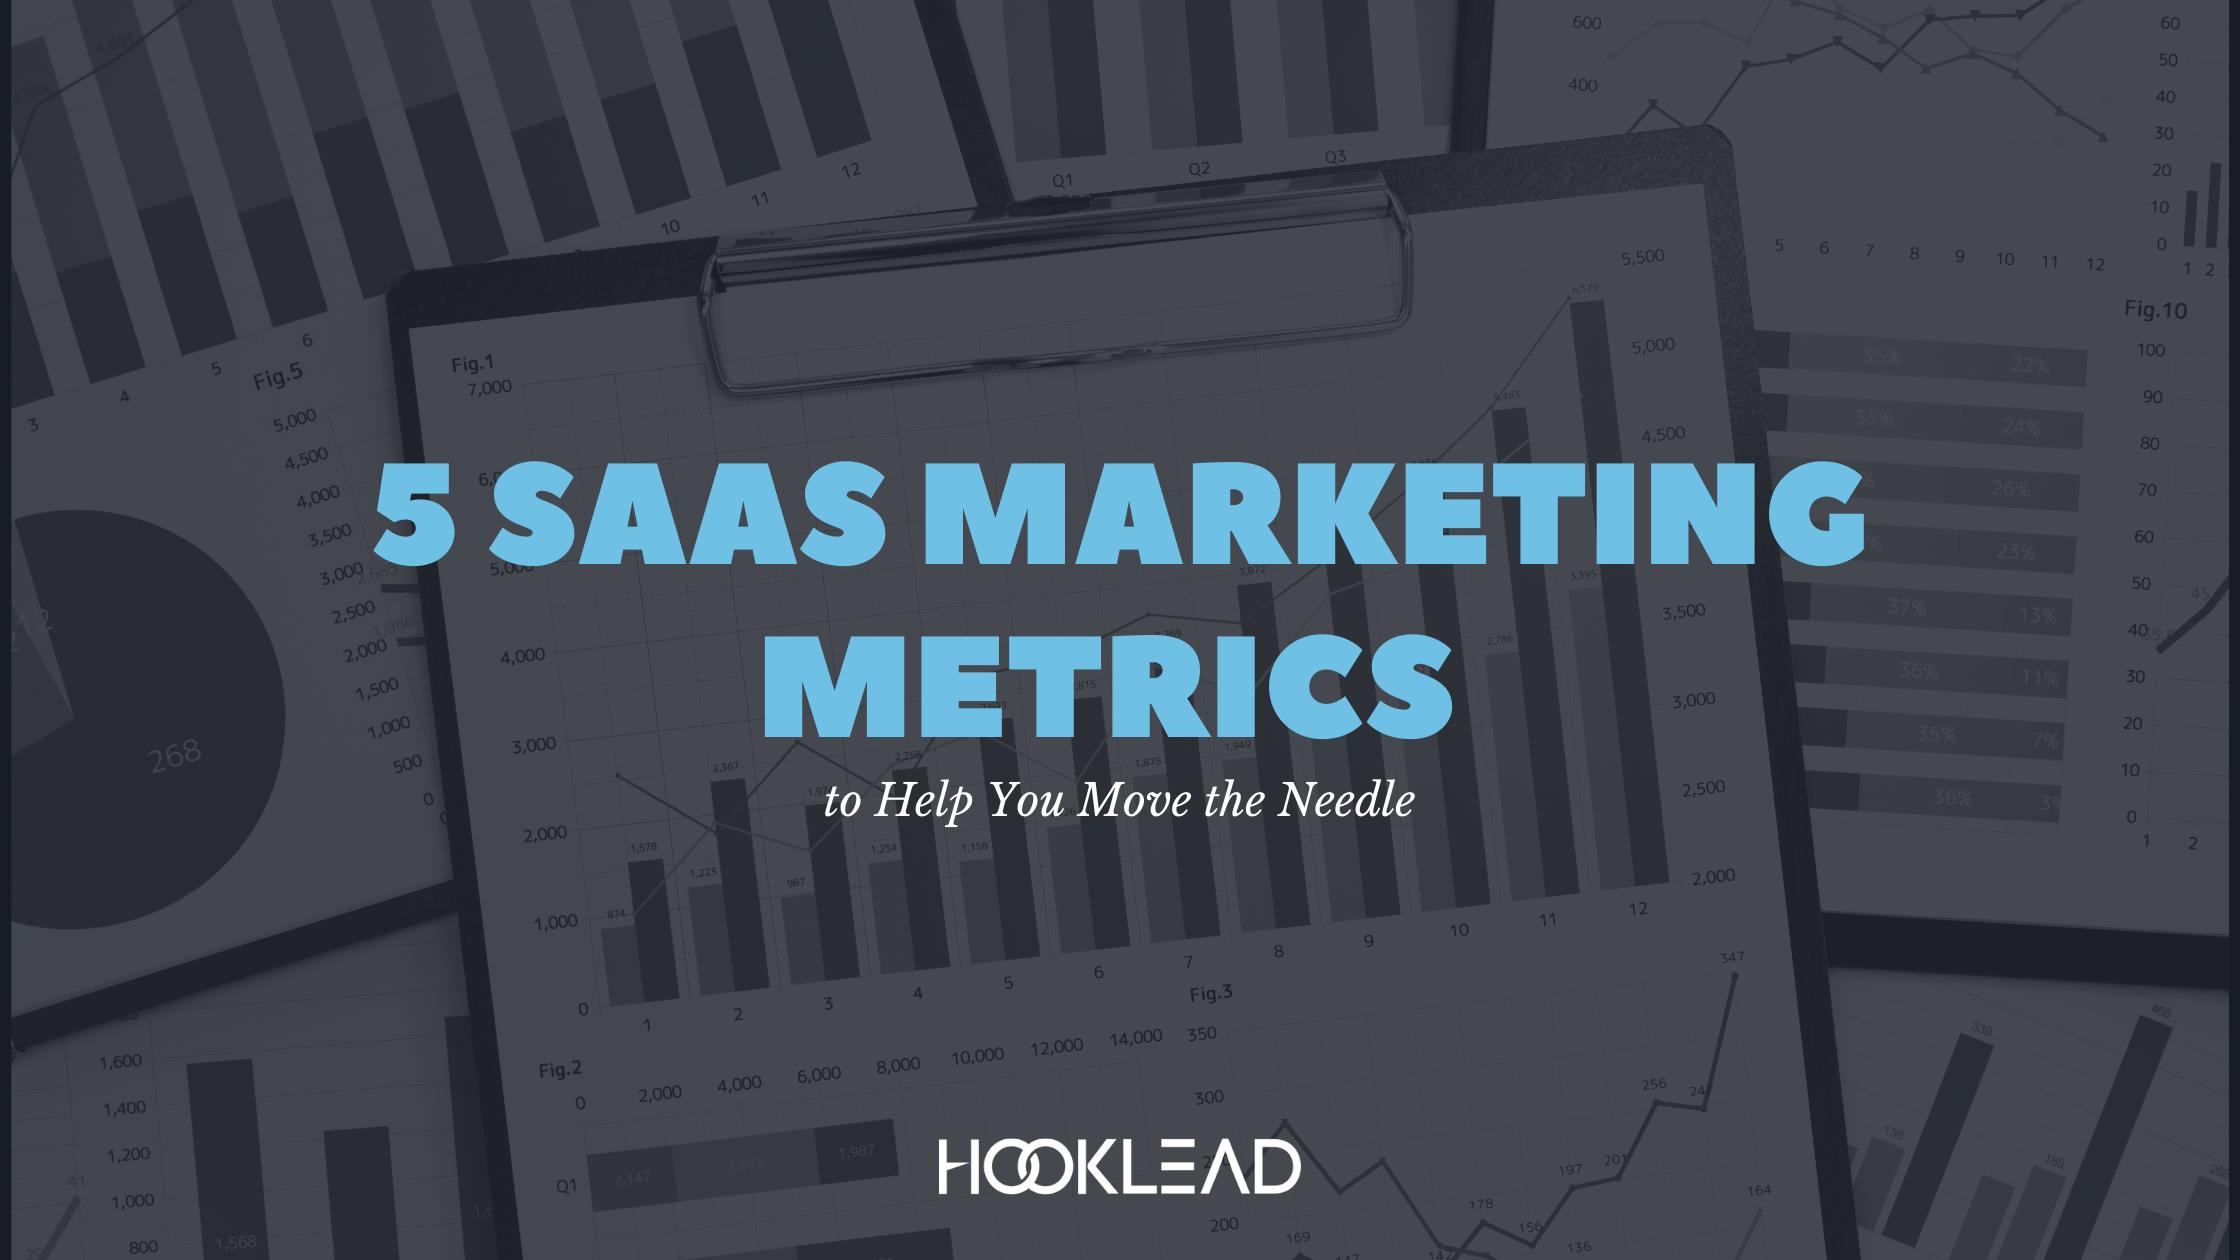 5 SaaS Marketing Metrics to Help You Move the Needle